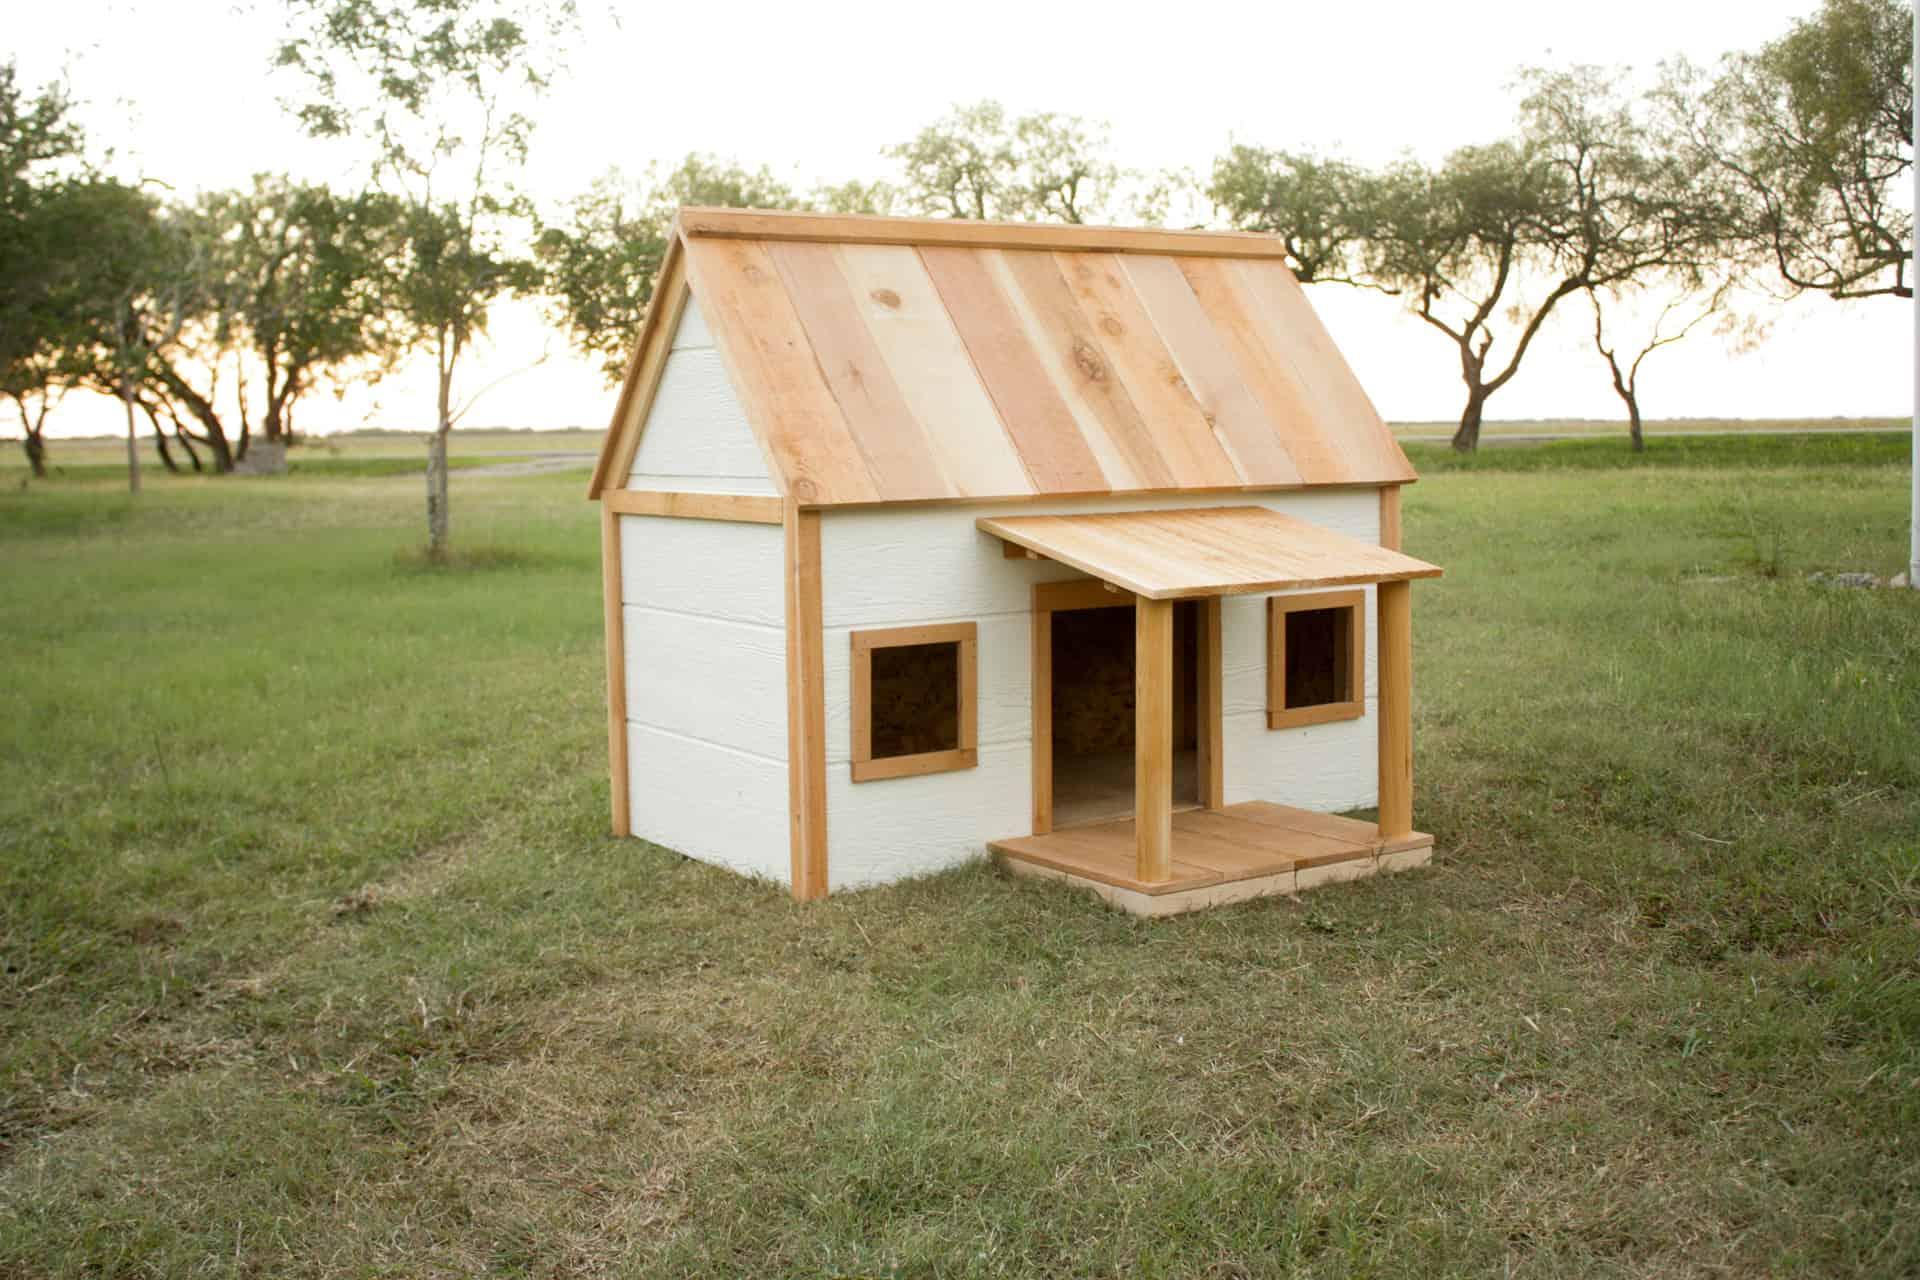 DIY Doghouse with Porch - cedar roof